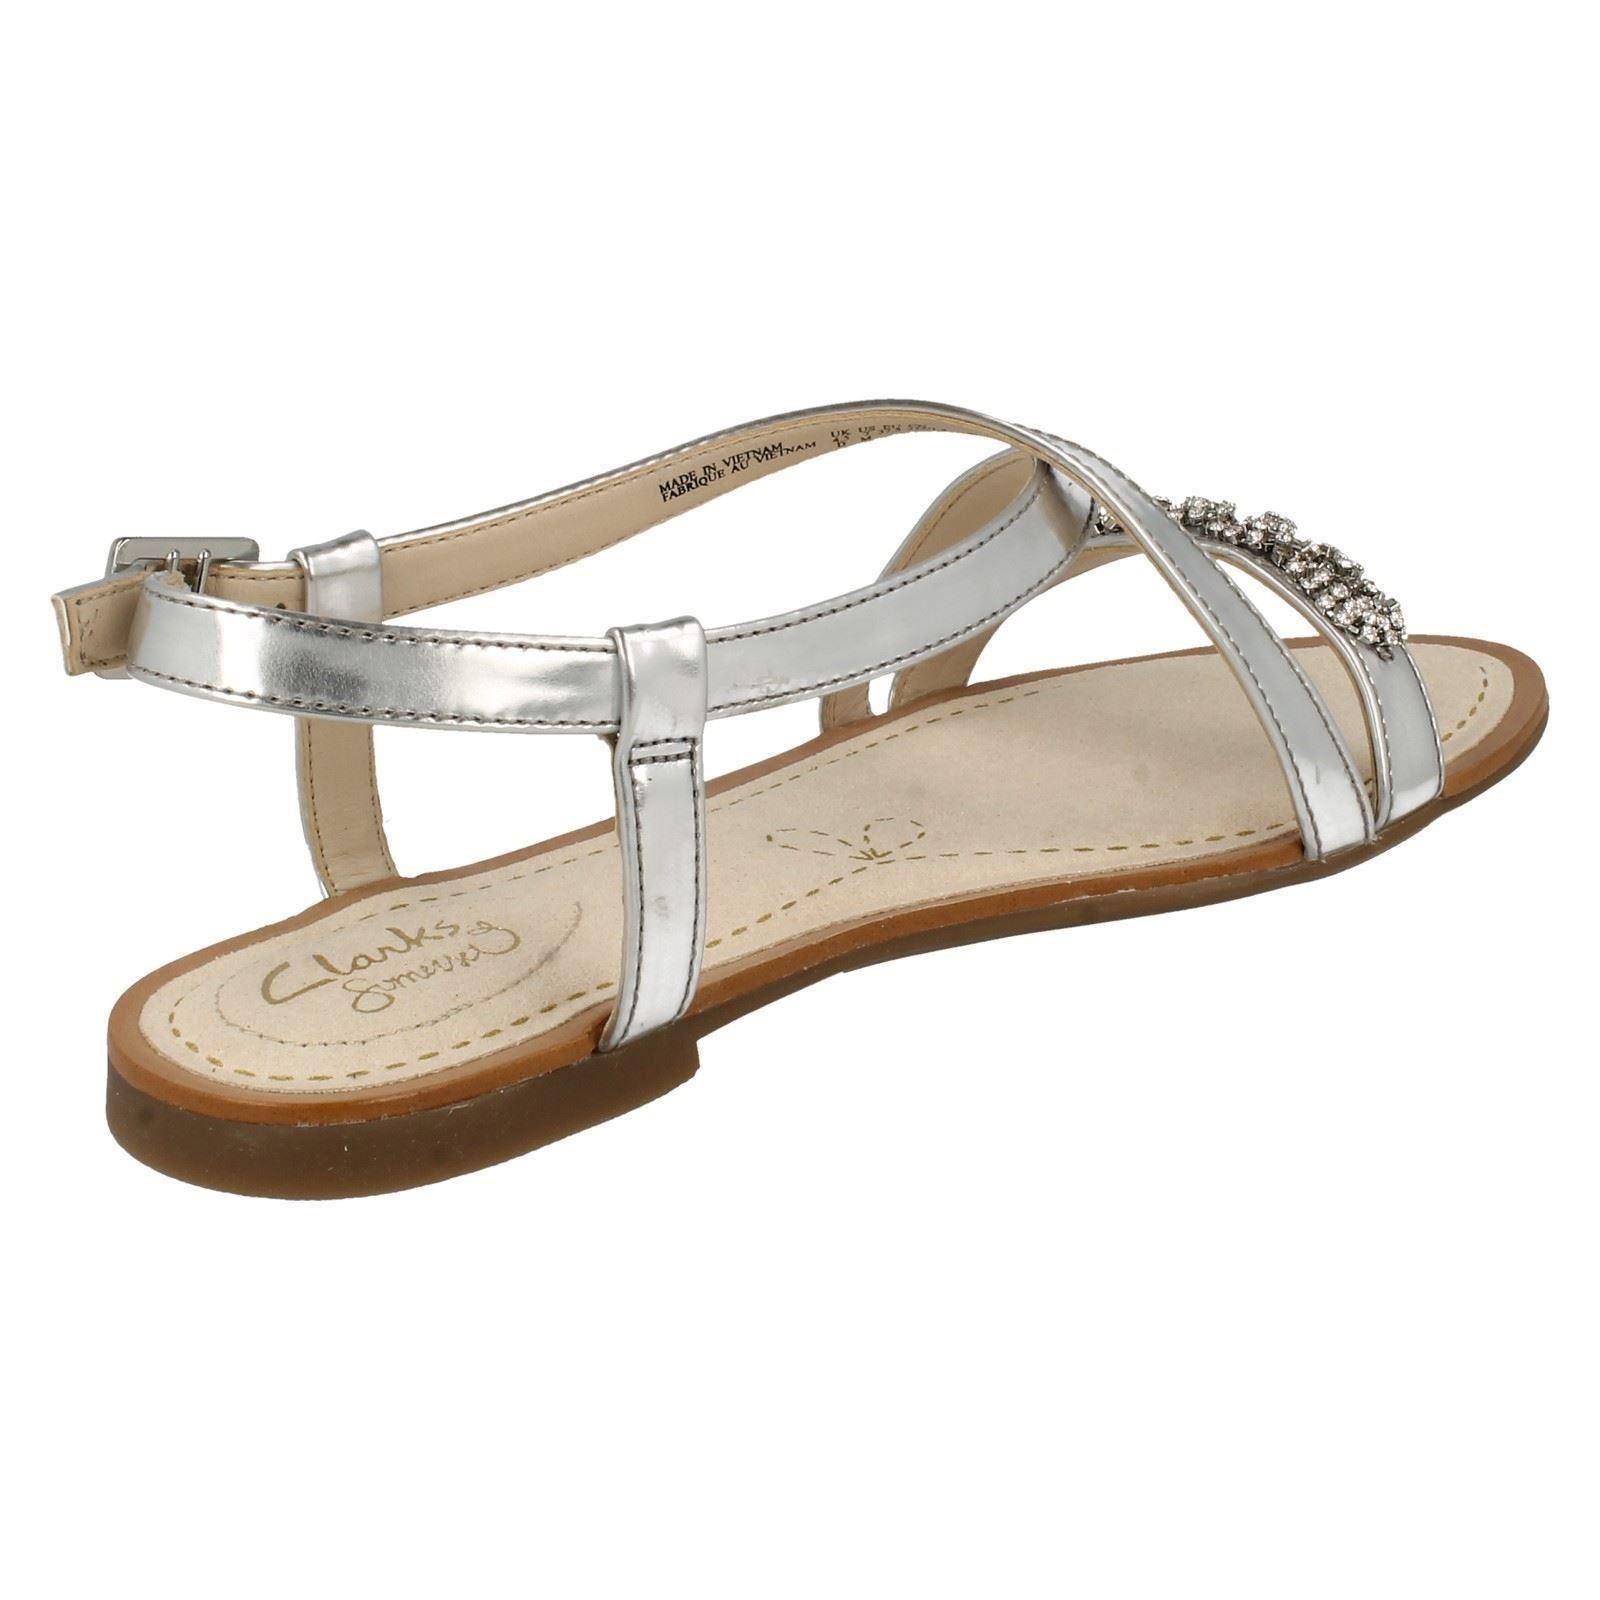 Ladies Clarks Strappy Flat Sandals Sail Breeze Ebay